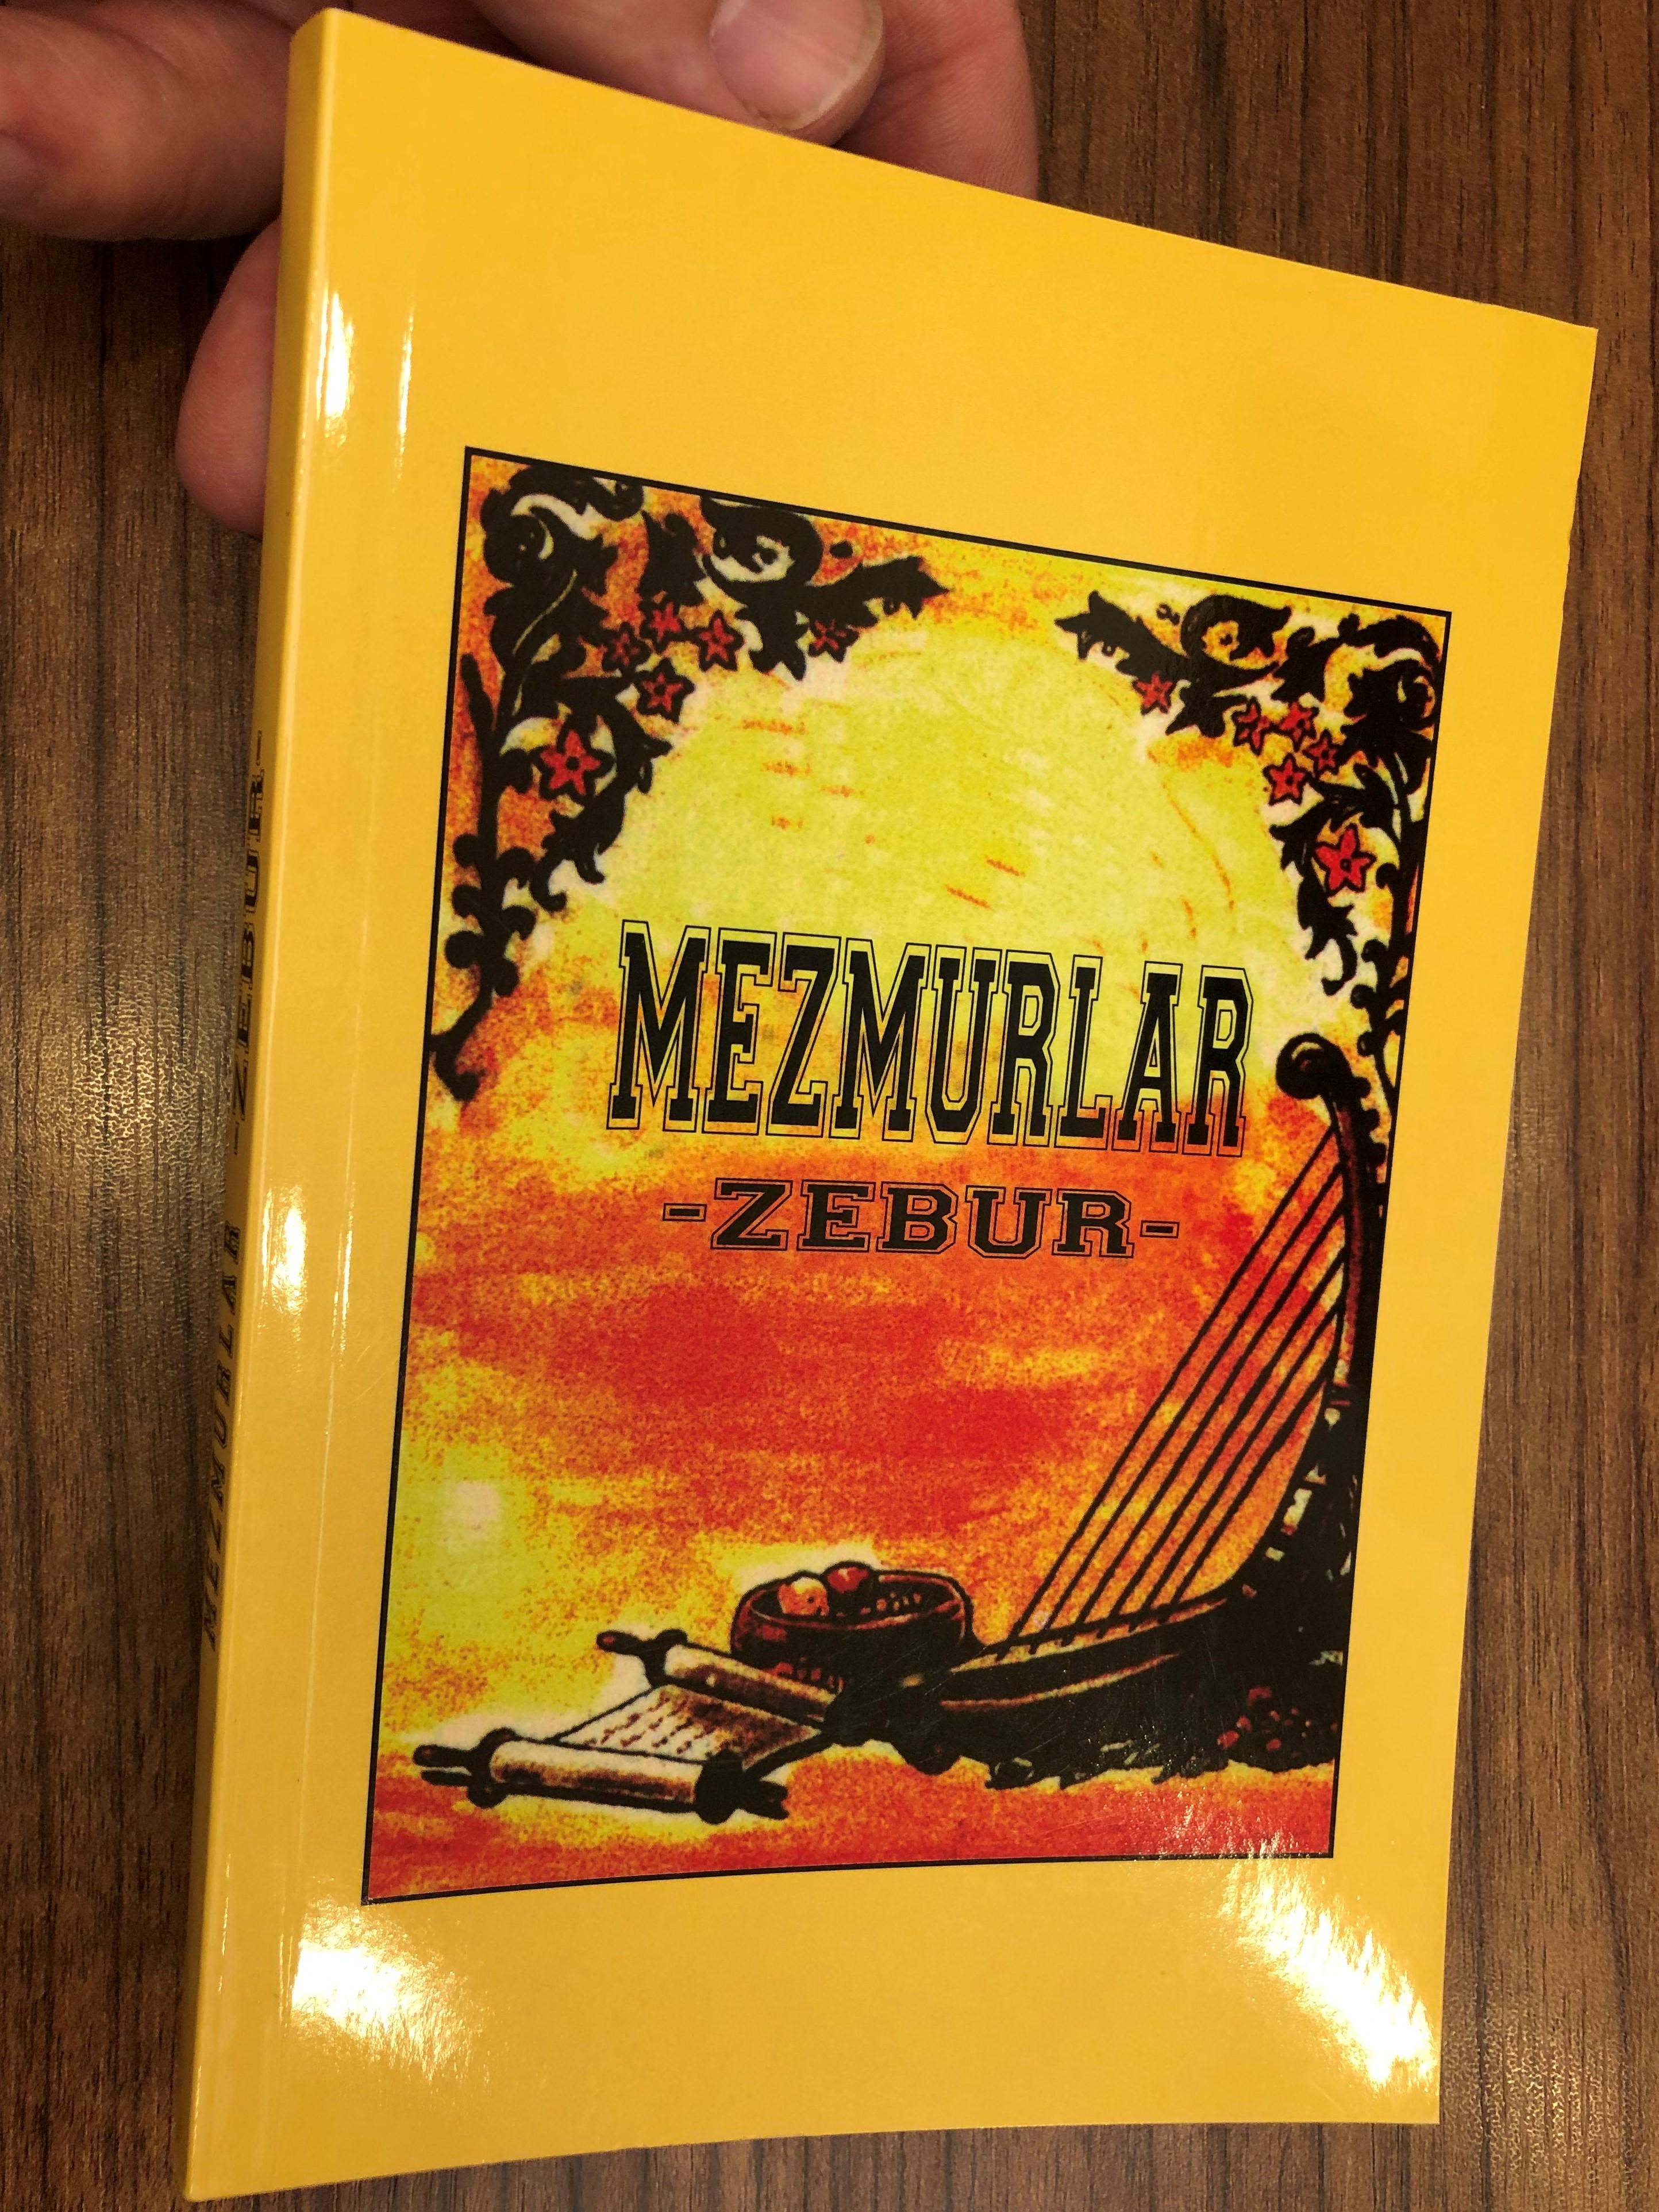 mezmurlar-zebur-zabur-psalms-in-turkish-new-translation-from-the-original-hebrew-language-kitabi-mukaddes-sirketi-paperback-2011-1-.jpg